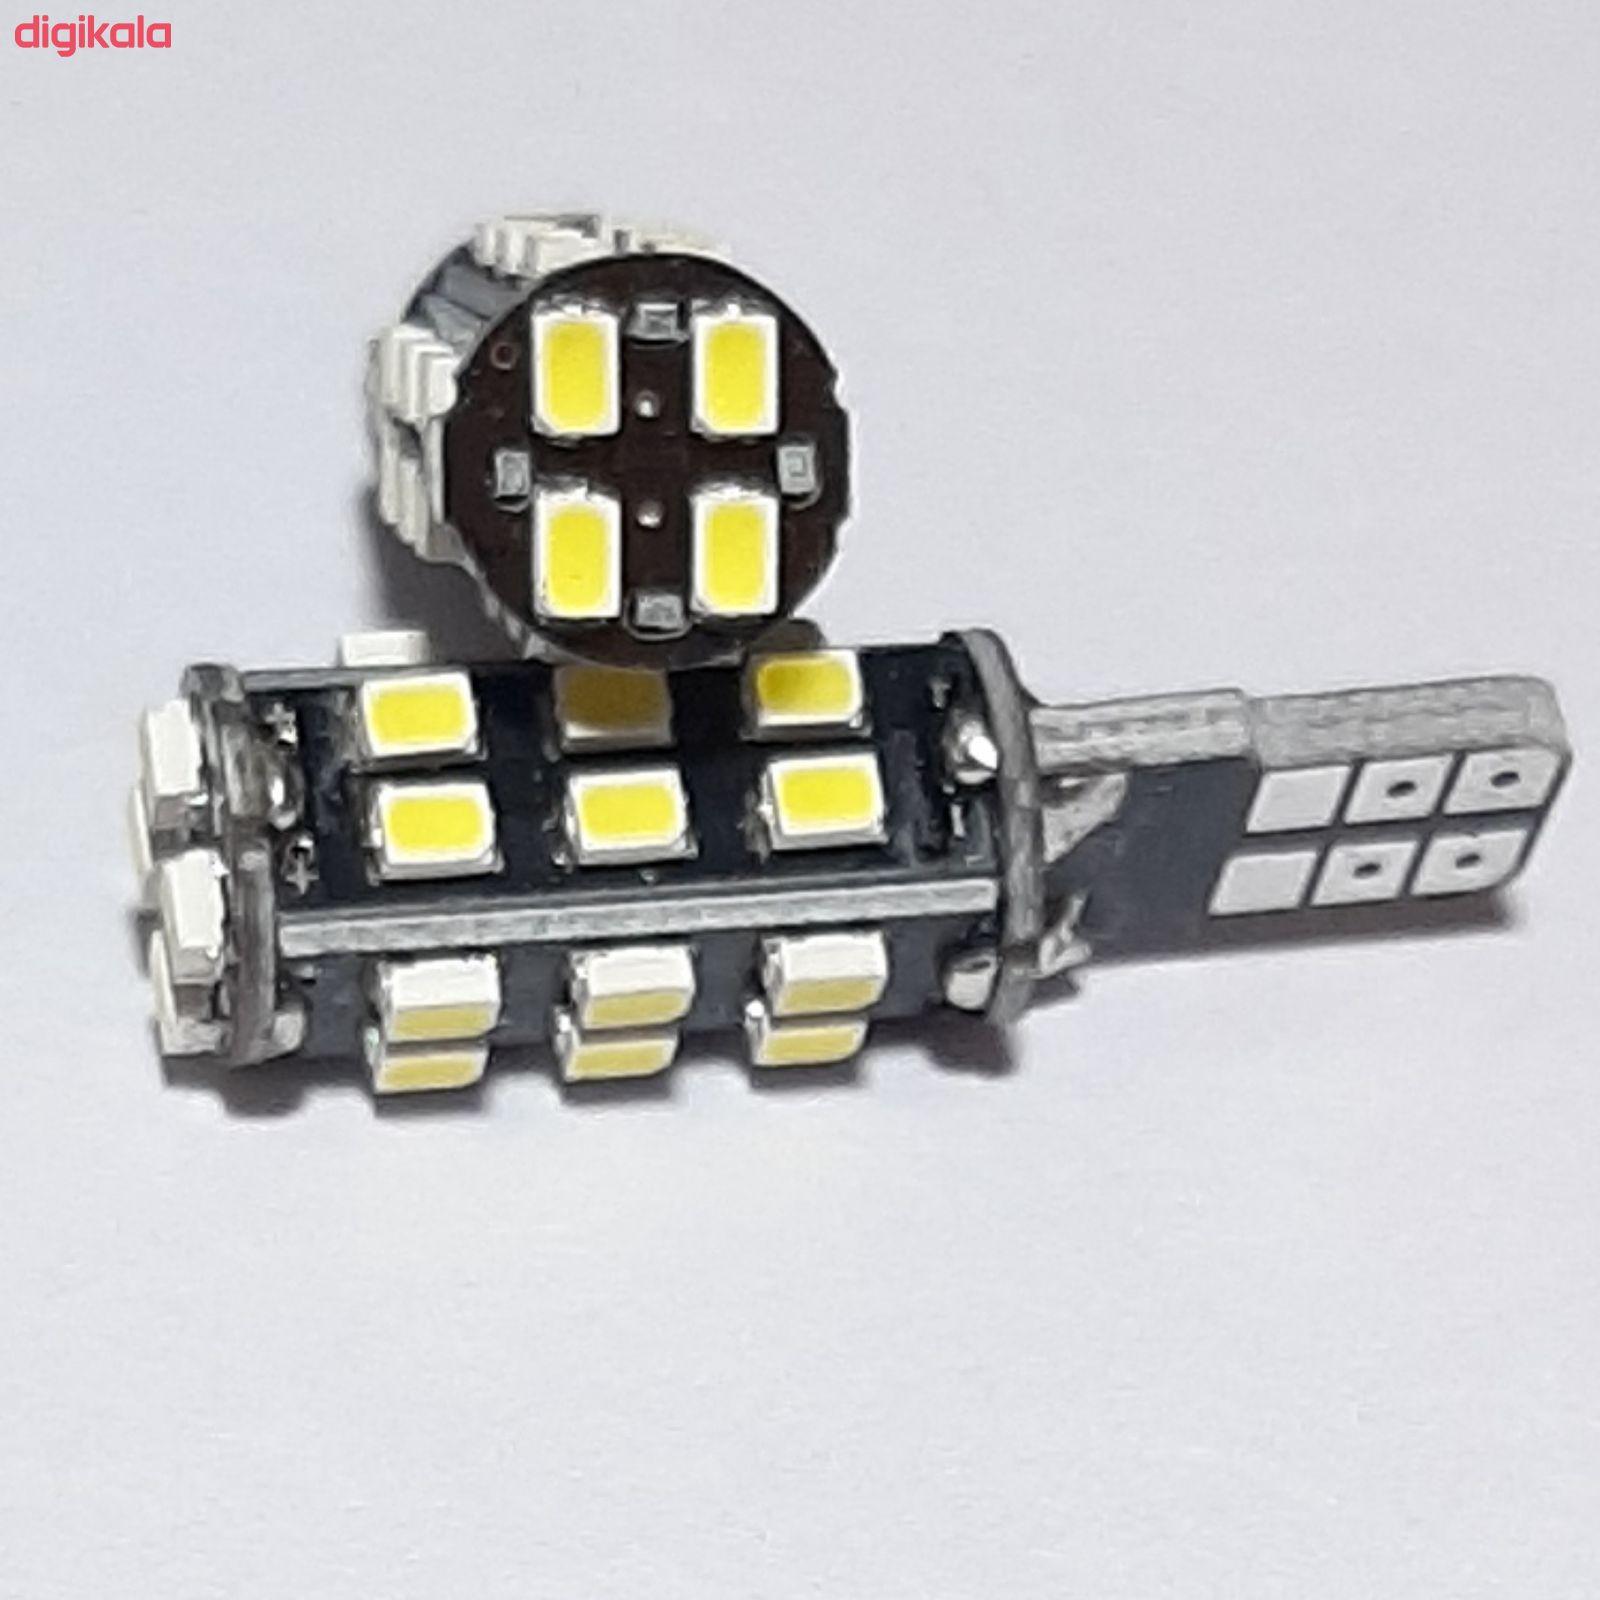 لامپ اس ام دی خودرو مدل S28 بسته 2 عددی main 1 3